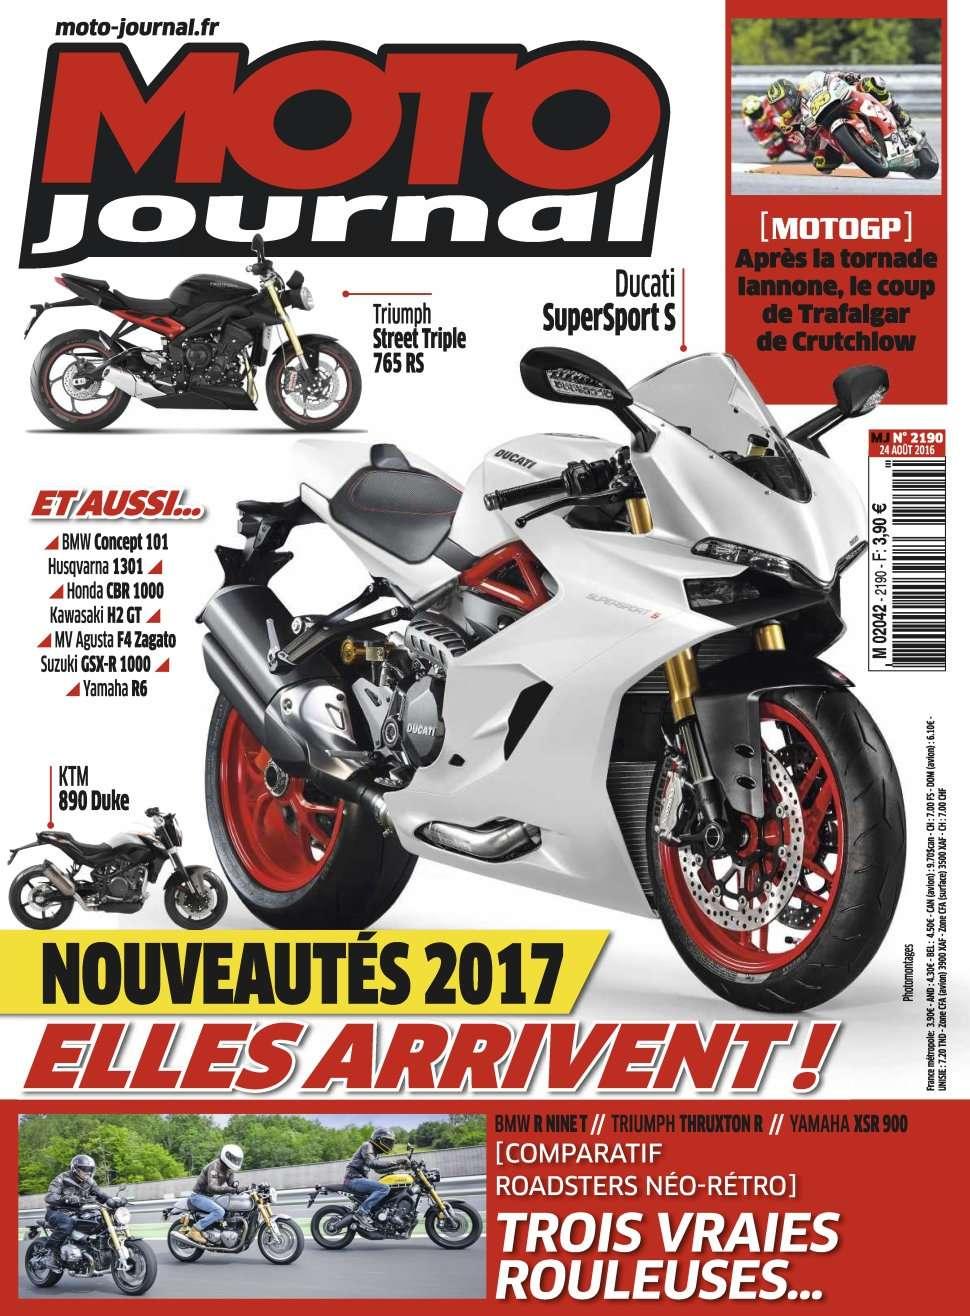 Moto Journal 2190 - 24 Août 2016